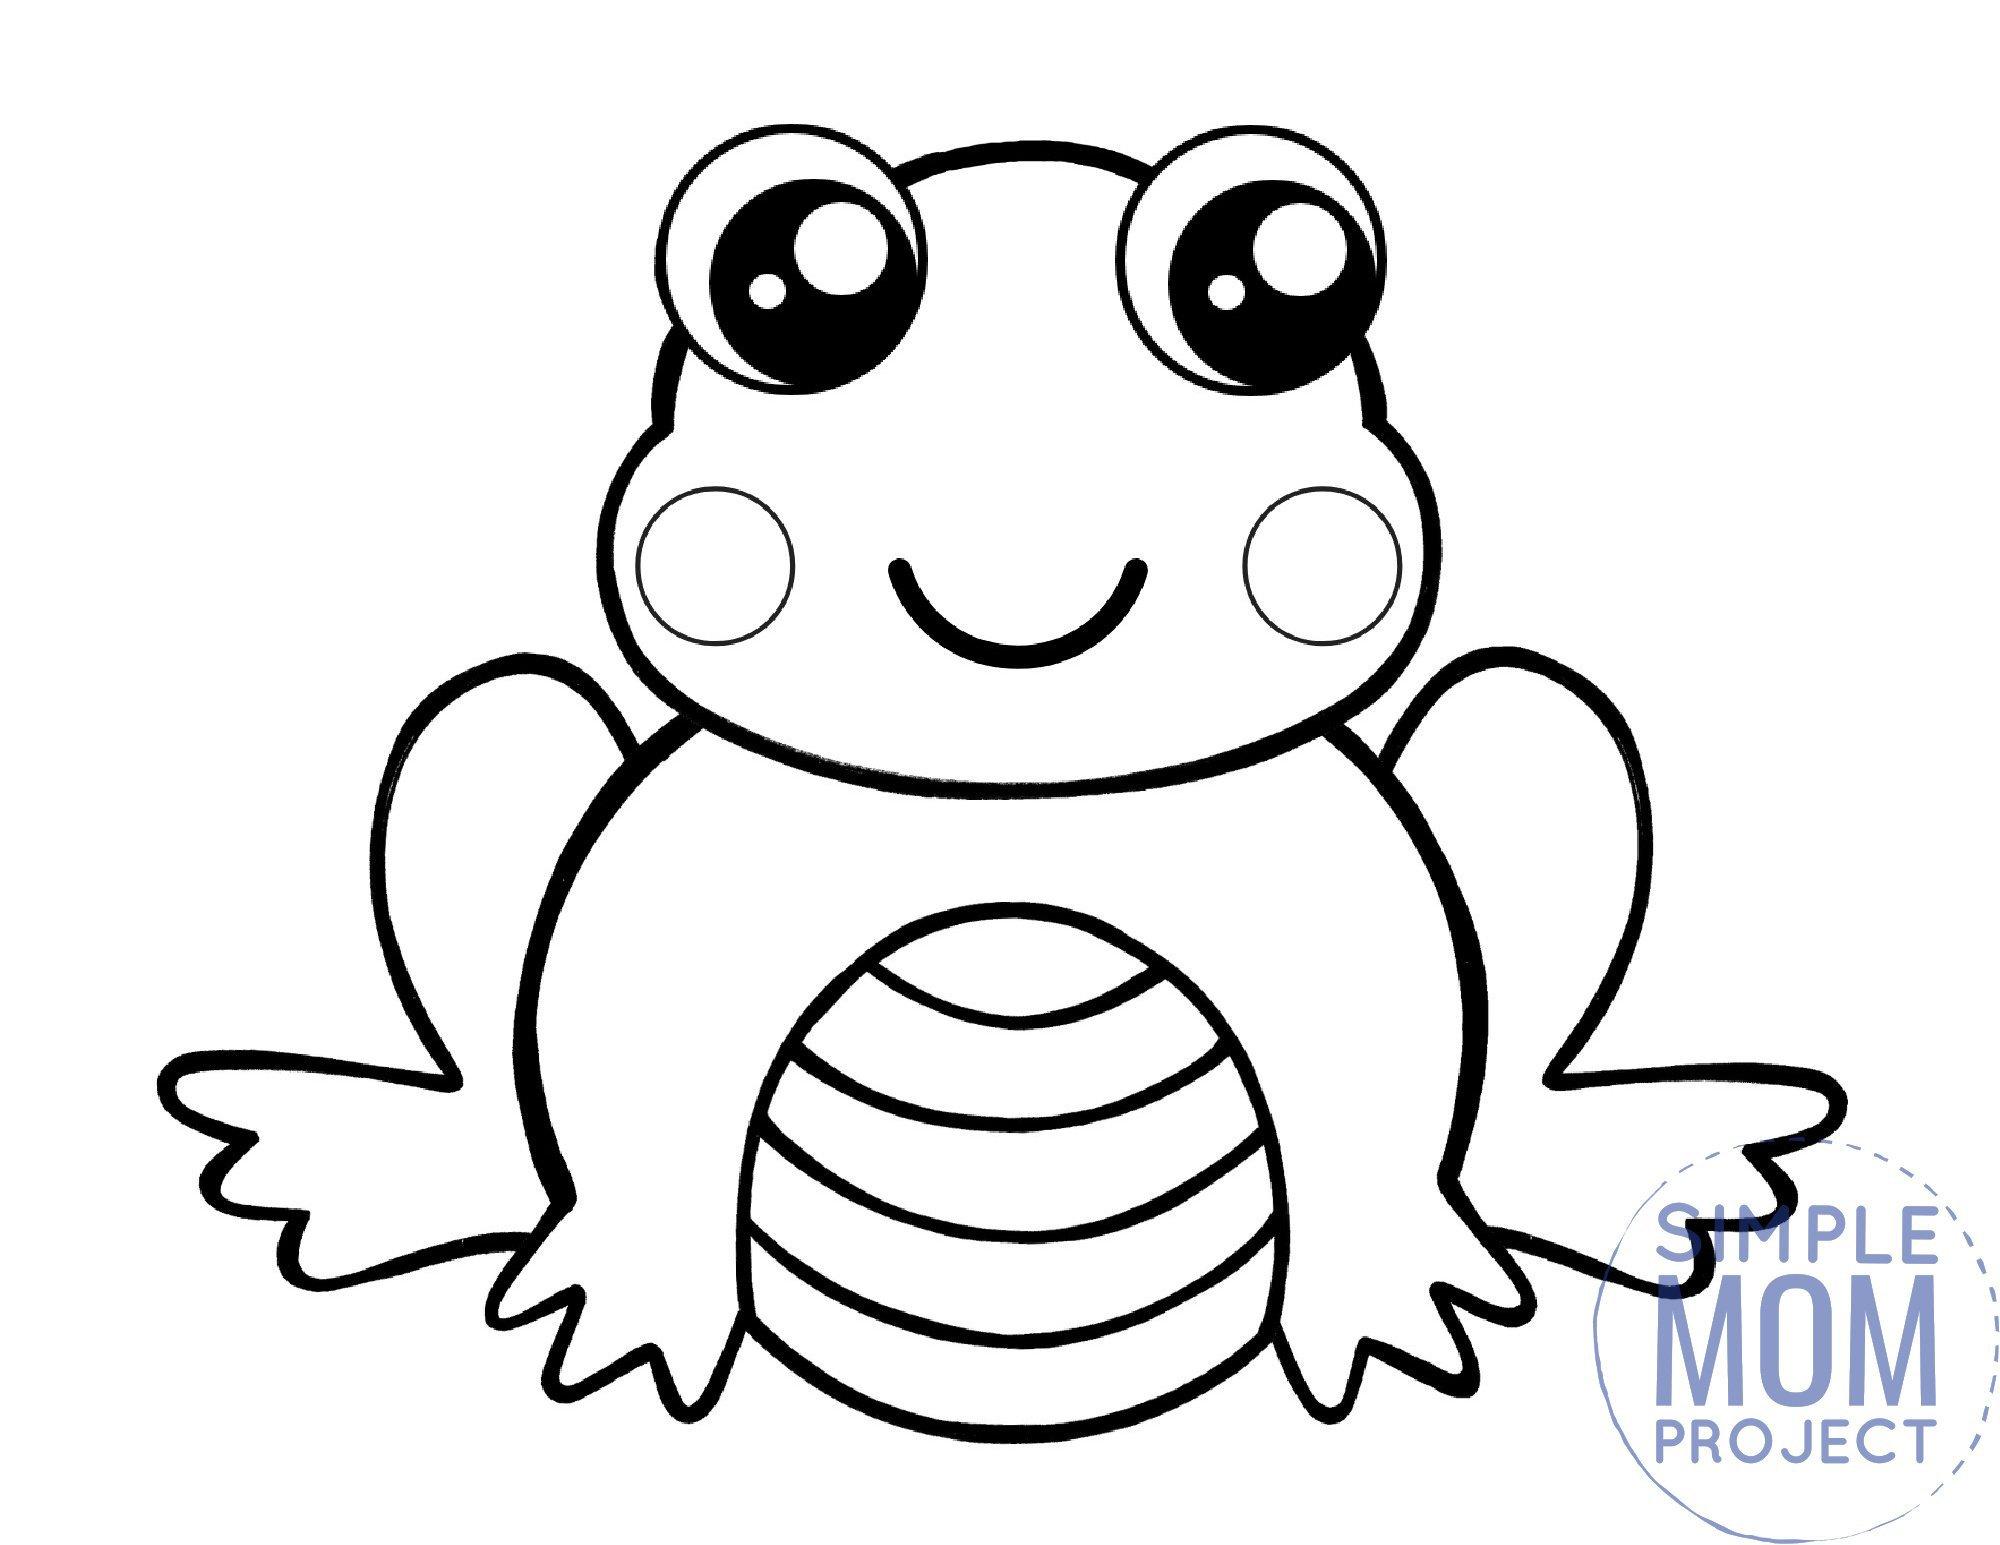 printable frog coloring page template for kids, preschoolers and kindergartners